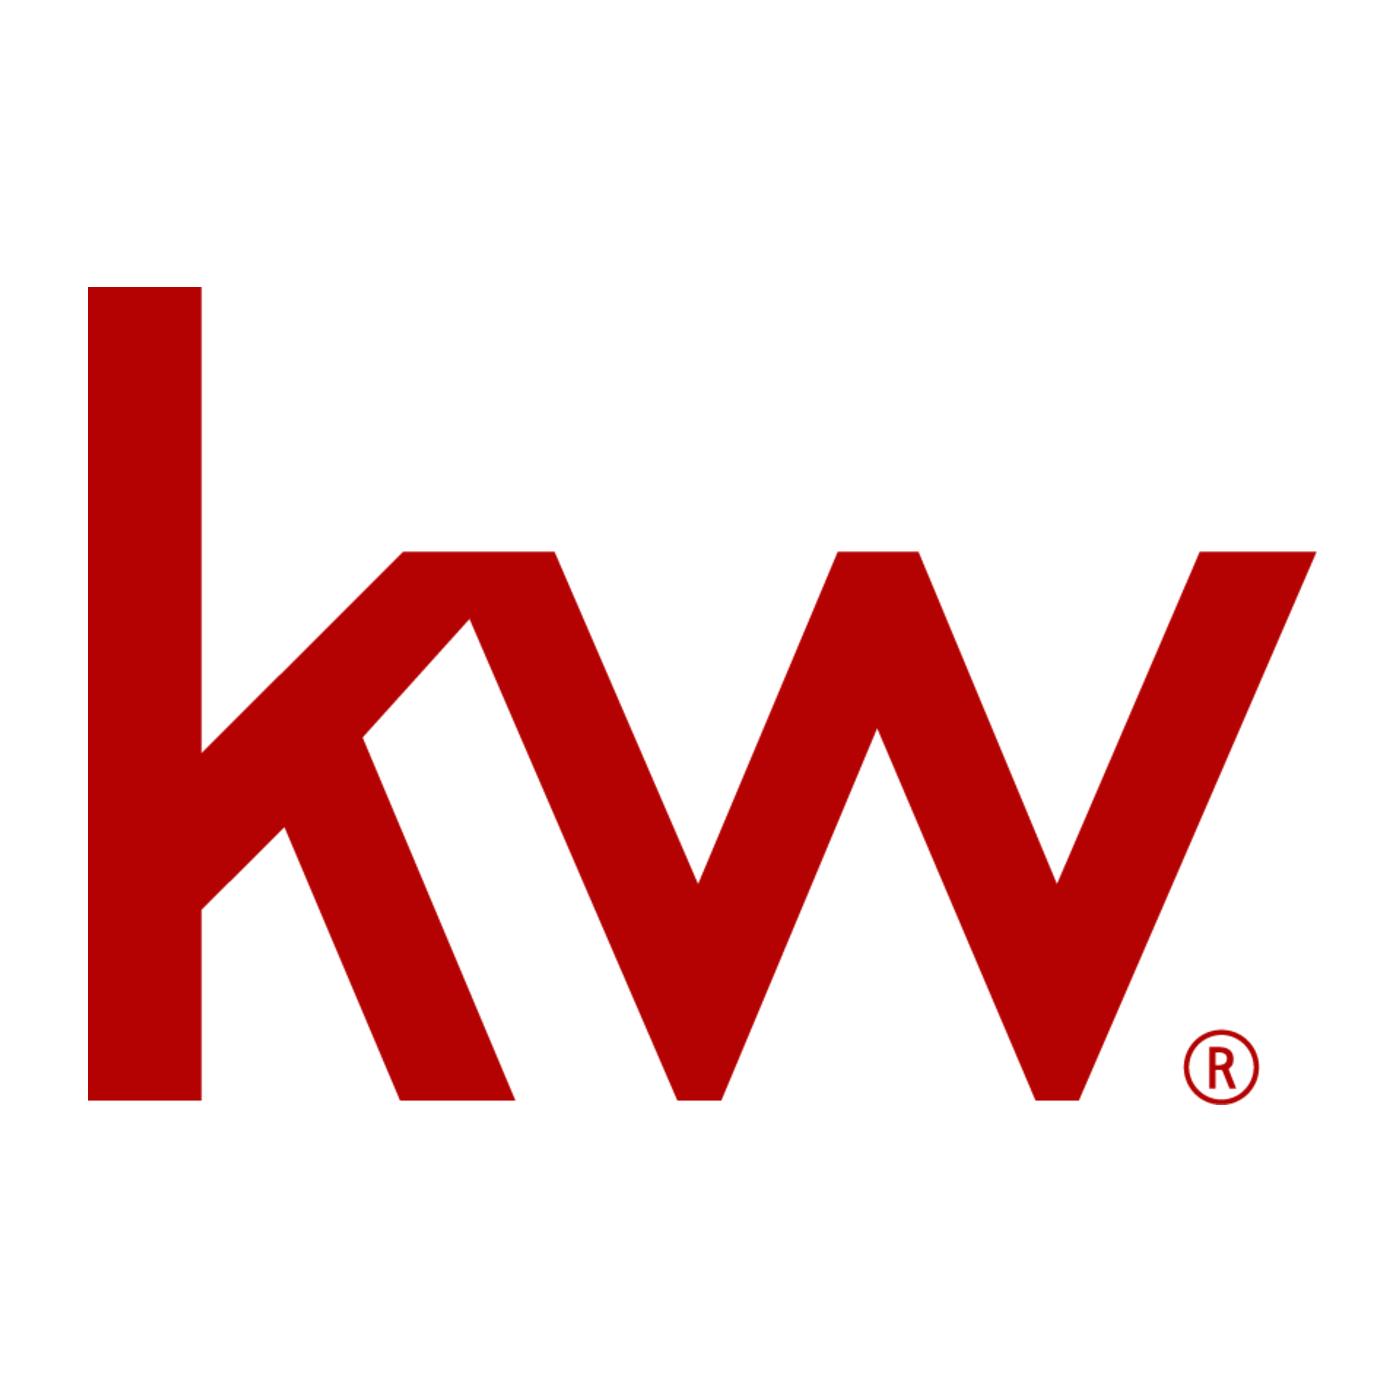 Karl Werrlein | Keller Williams